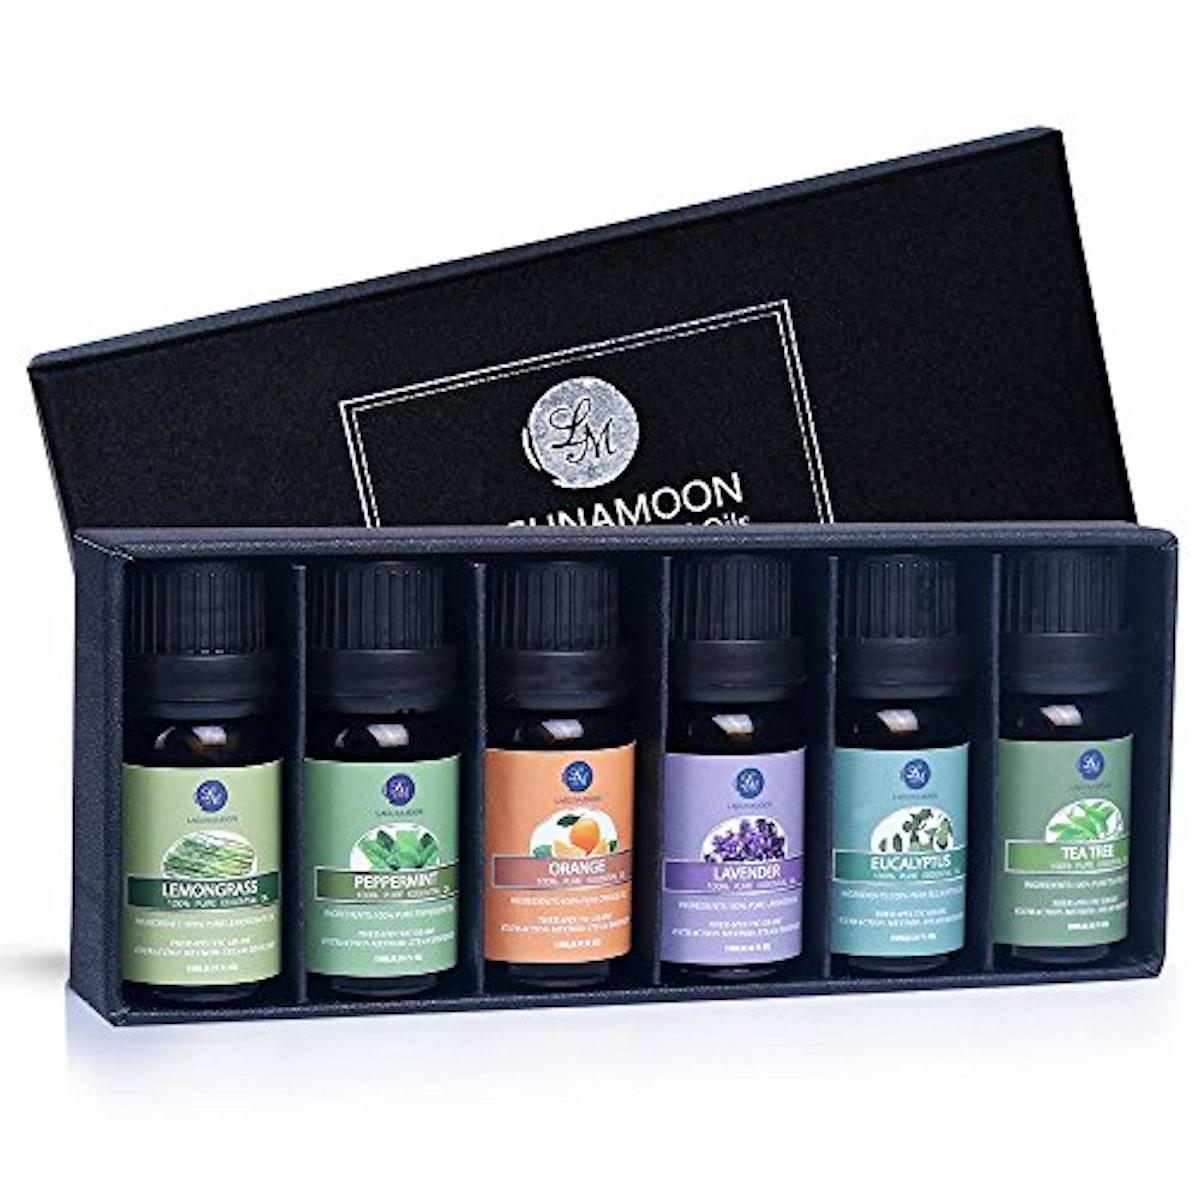 Lagunamoon Essential Oils Gift Set